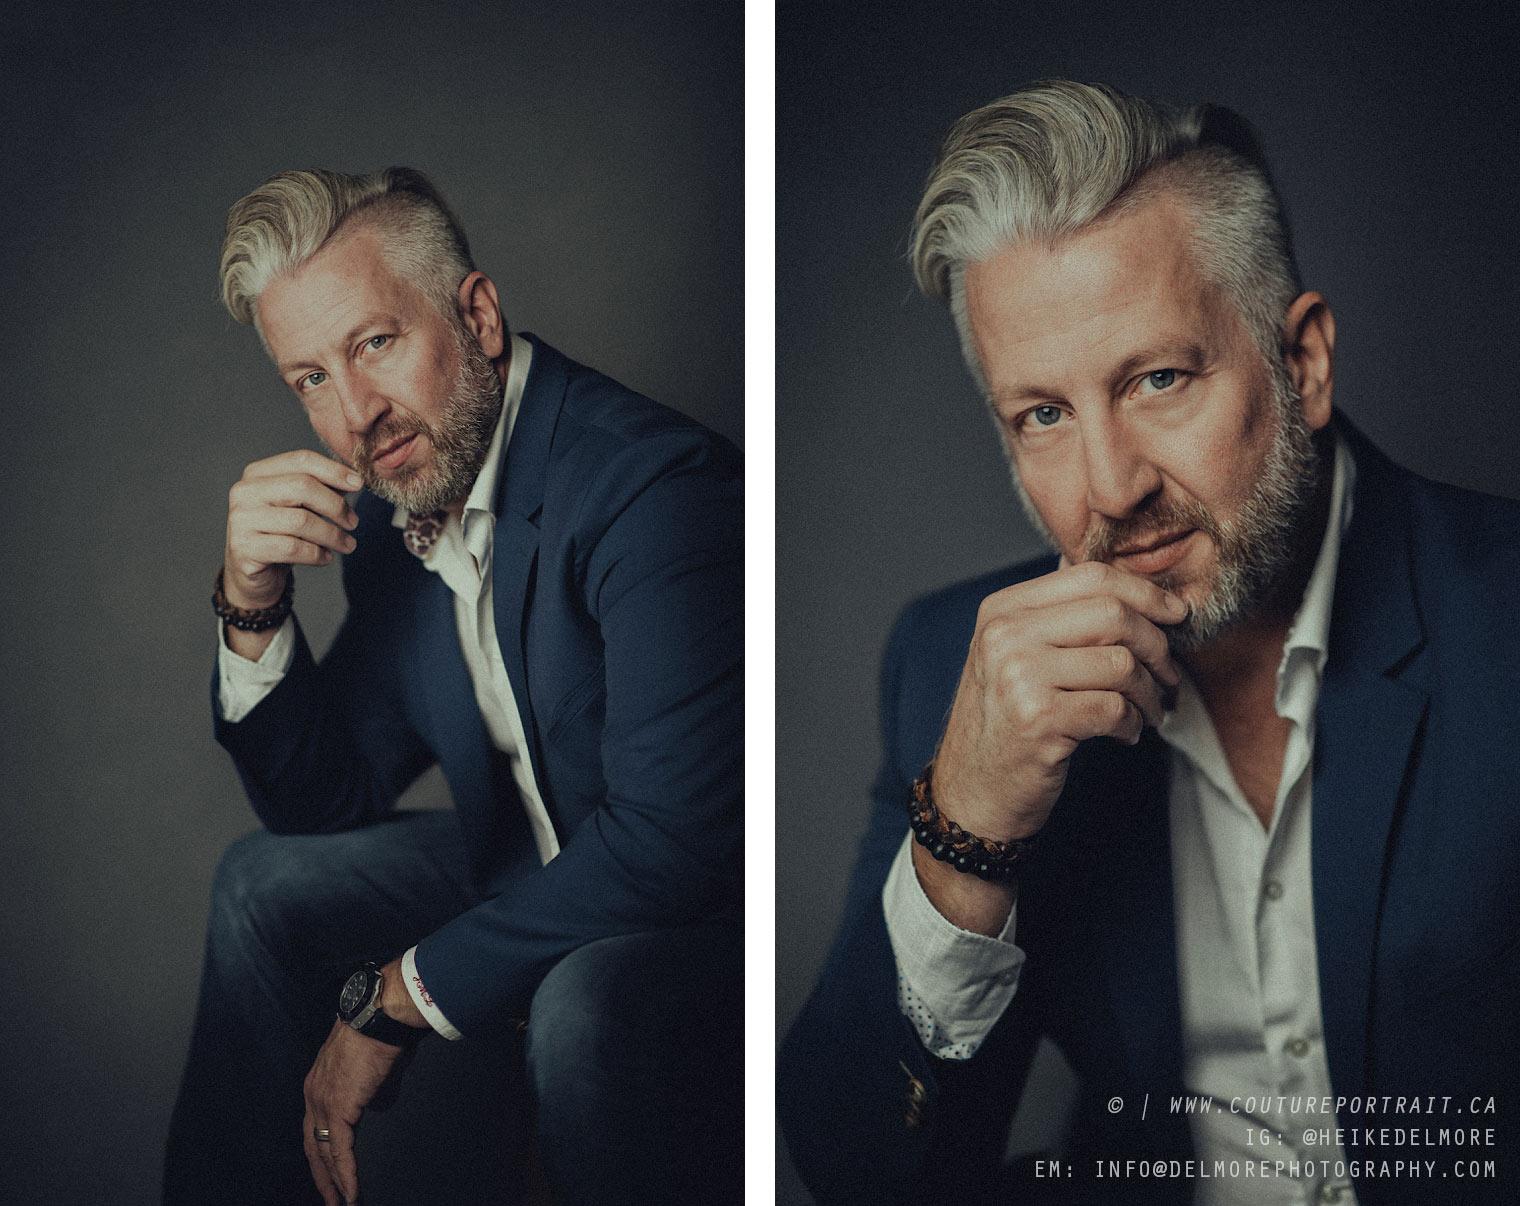 Heike Delmore Portrait Photography Windsor Ontario